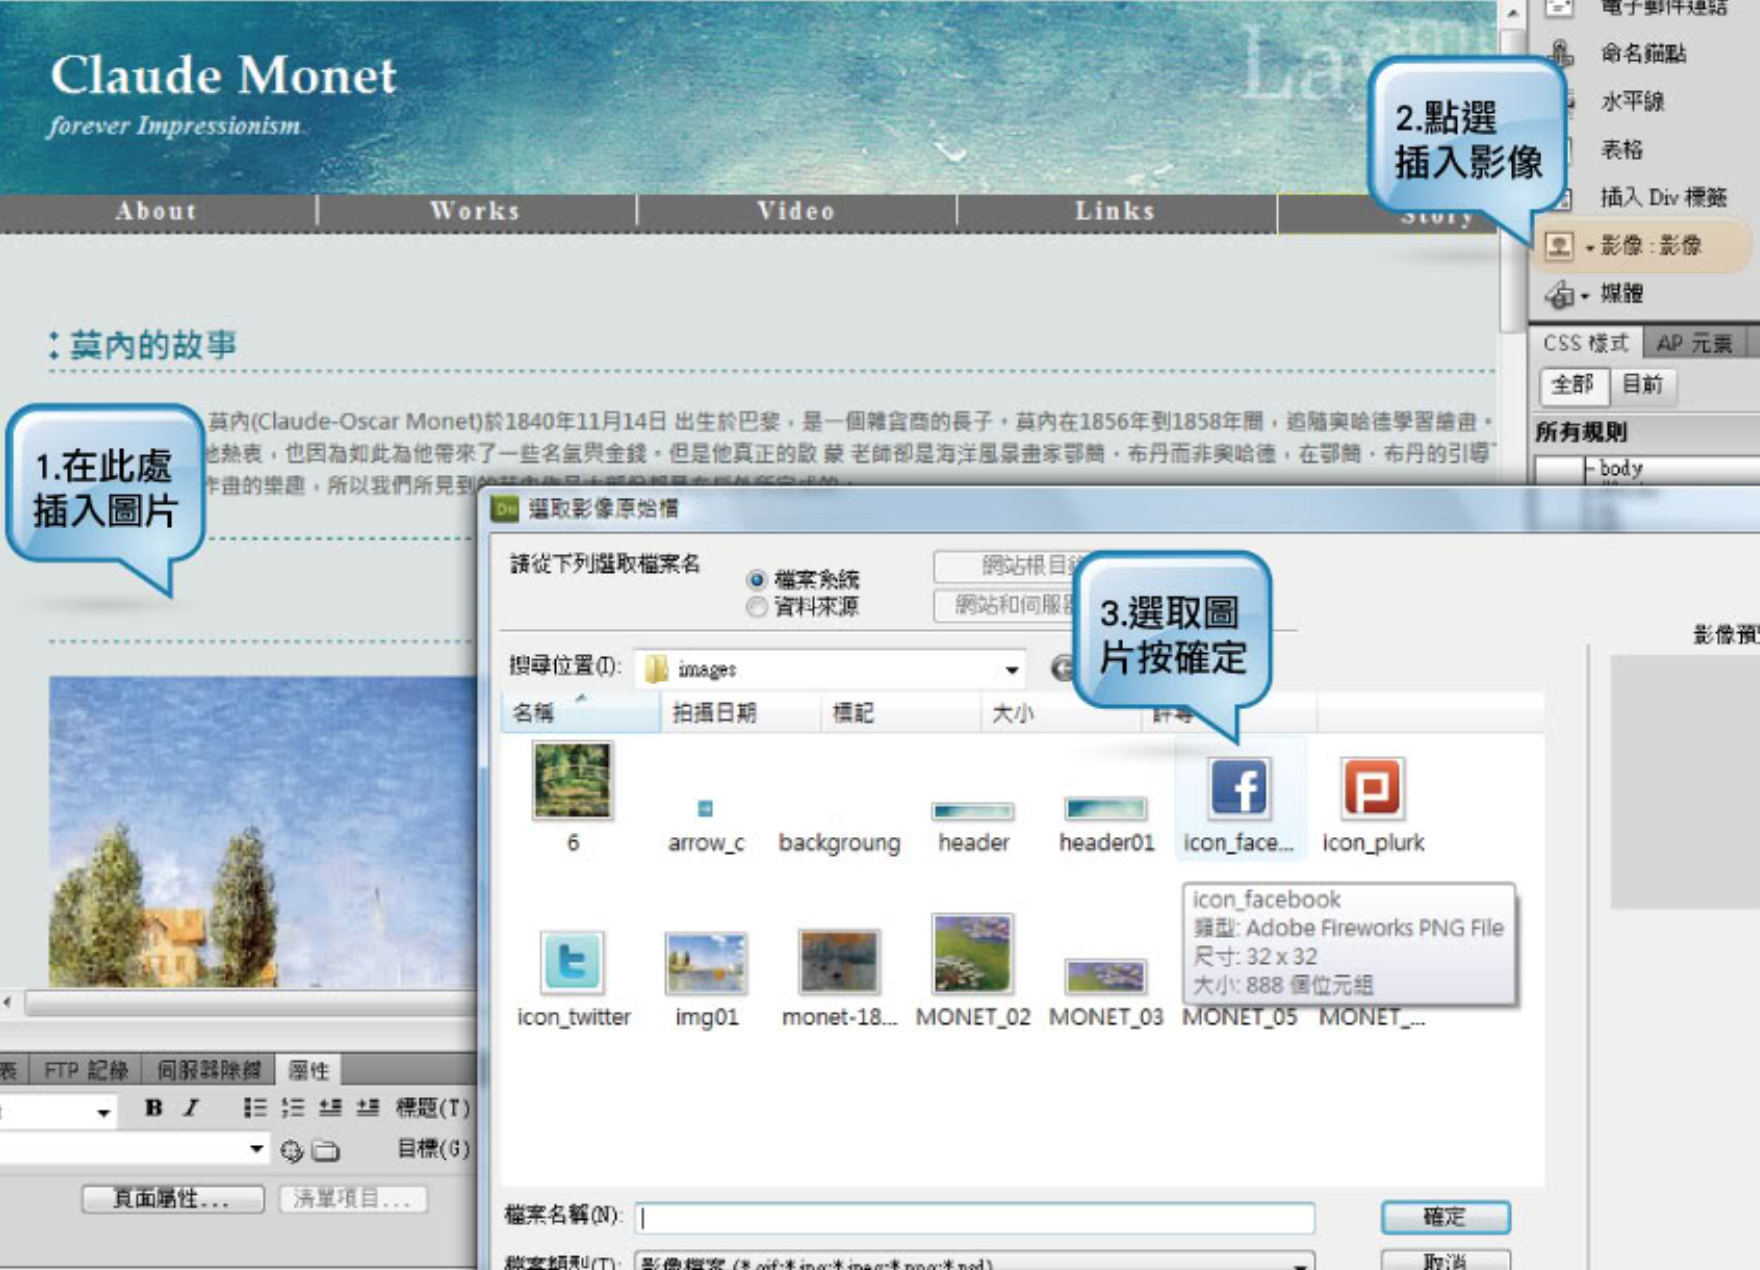 http://mepopedia.com/~jinjin/web/img/510.png